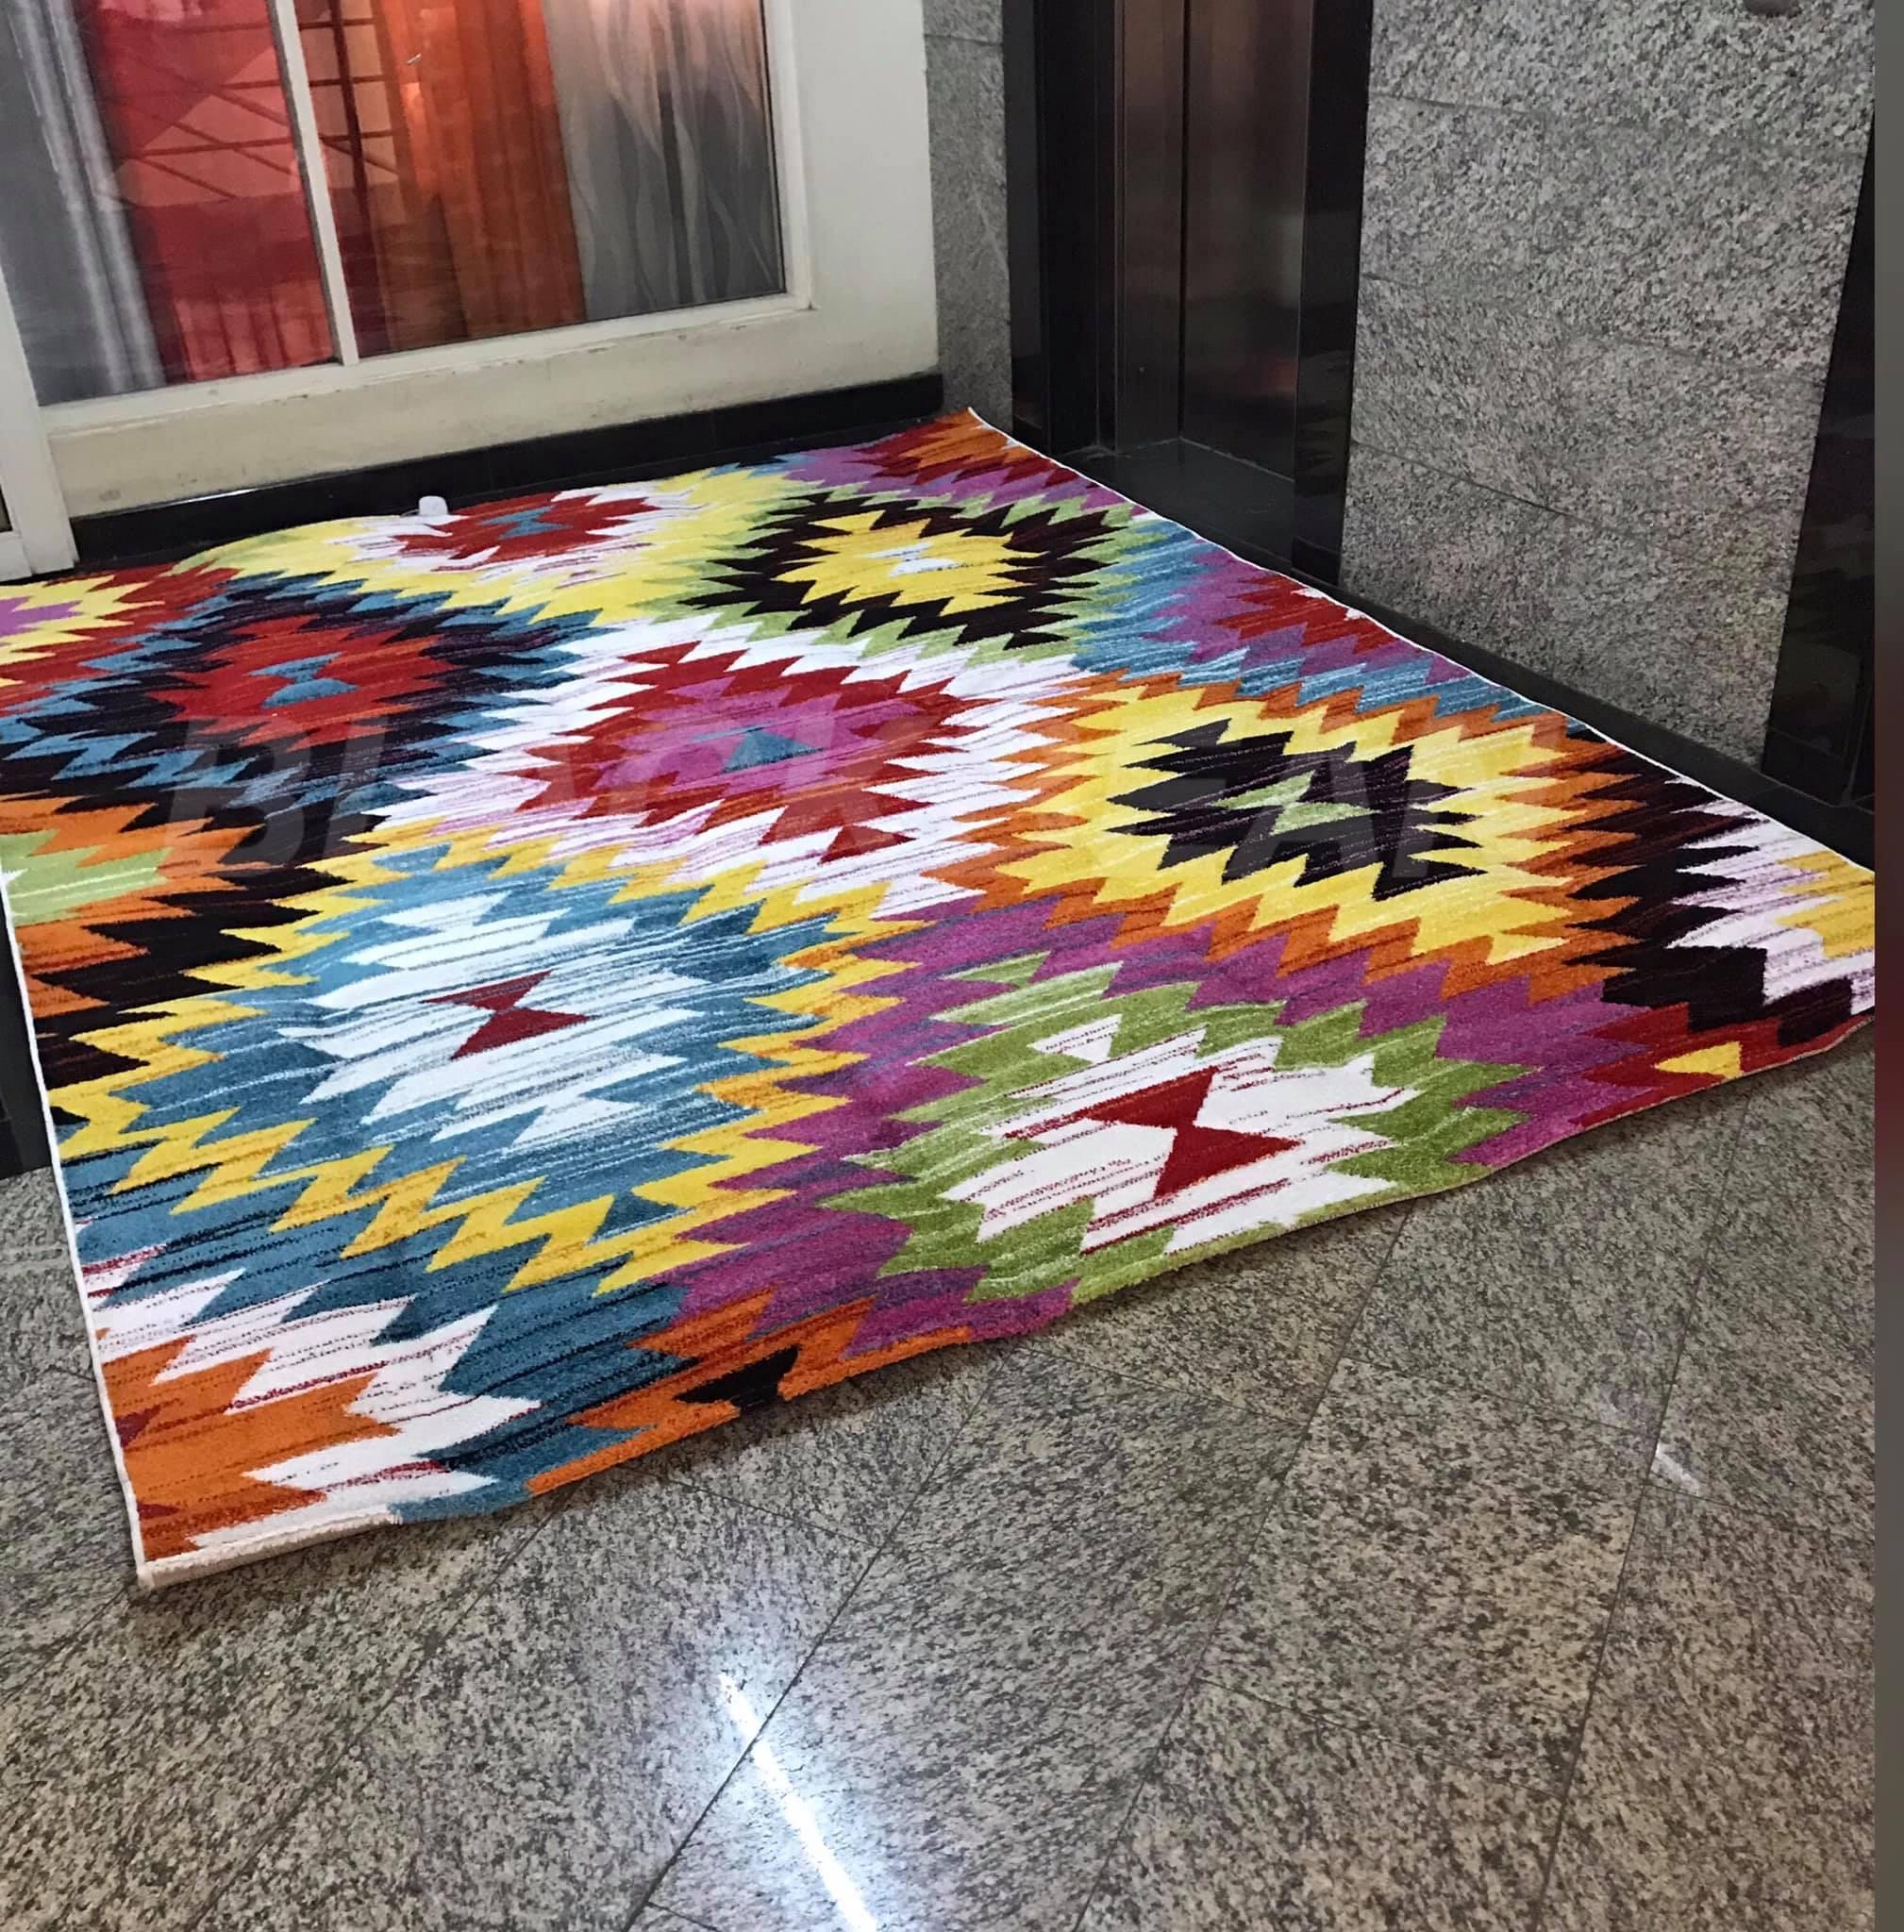 Multi-colored carpet